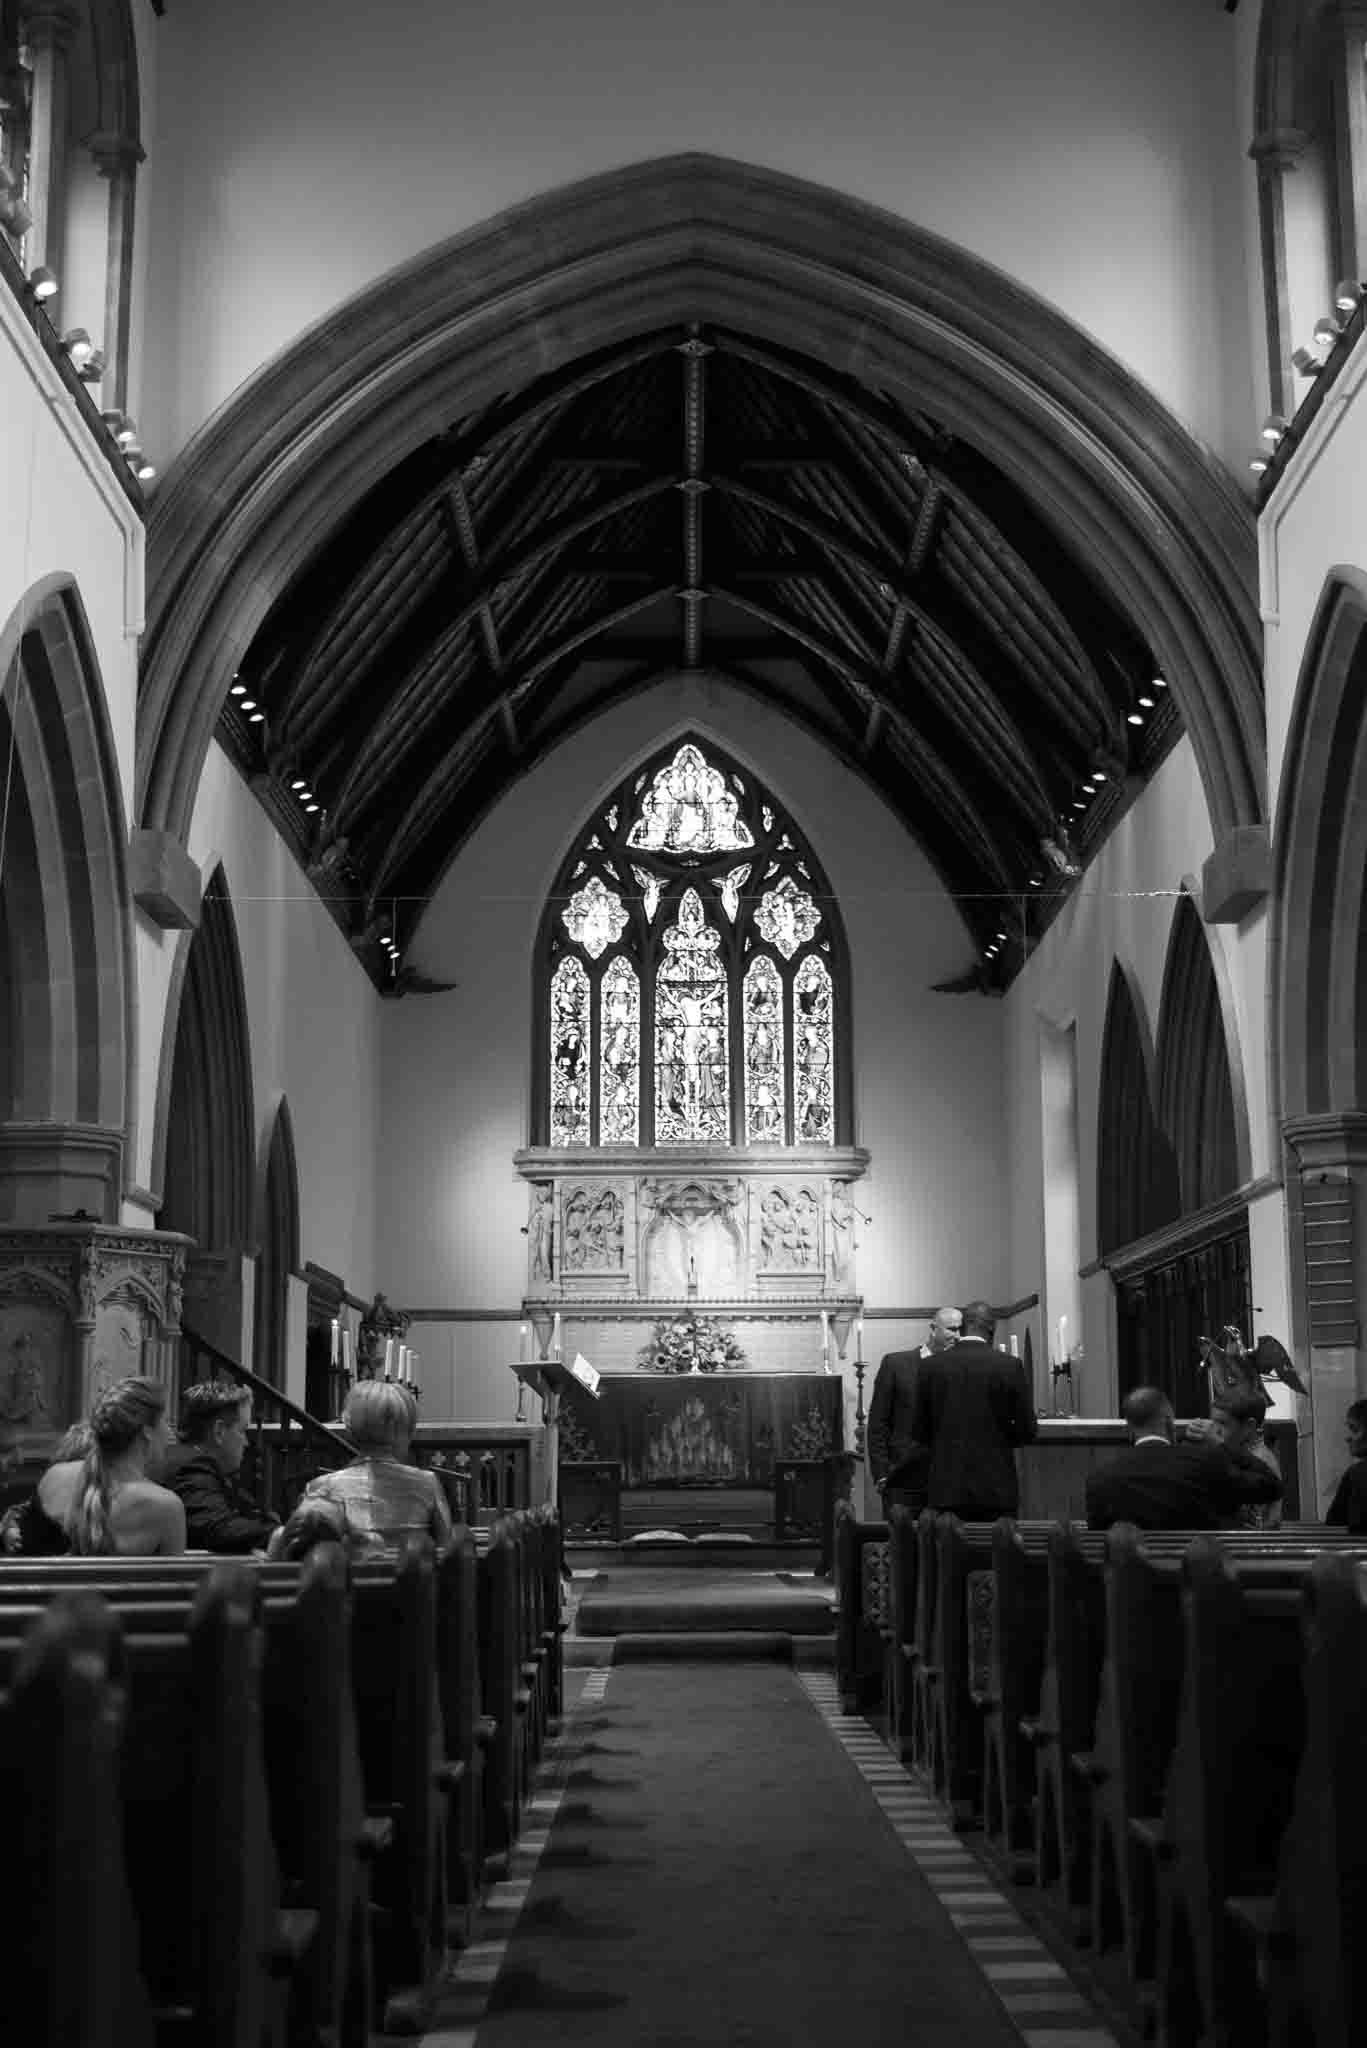 St Mary & All Saints Beaconsfield, St Mary's Beaconsfield, Beaconsfield wedding photographer, Beaconsfield wedding, Buckinghamshire wedding, Reportage wedding photography